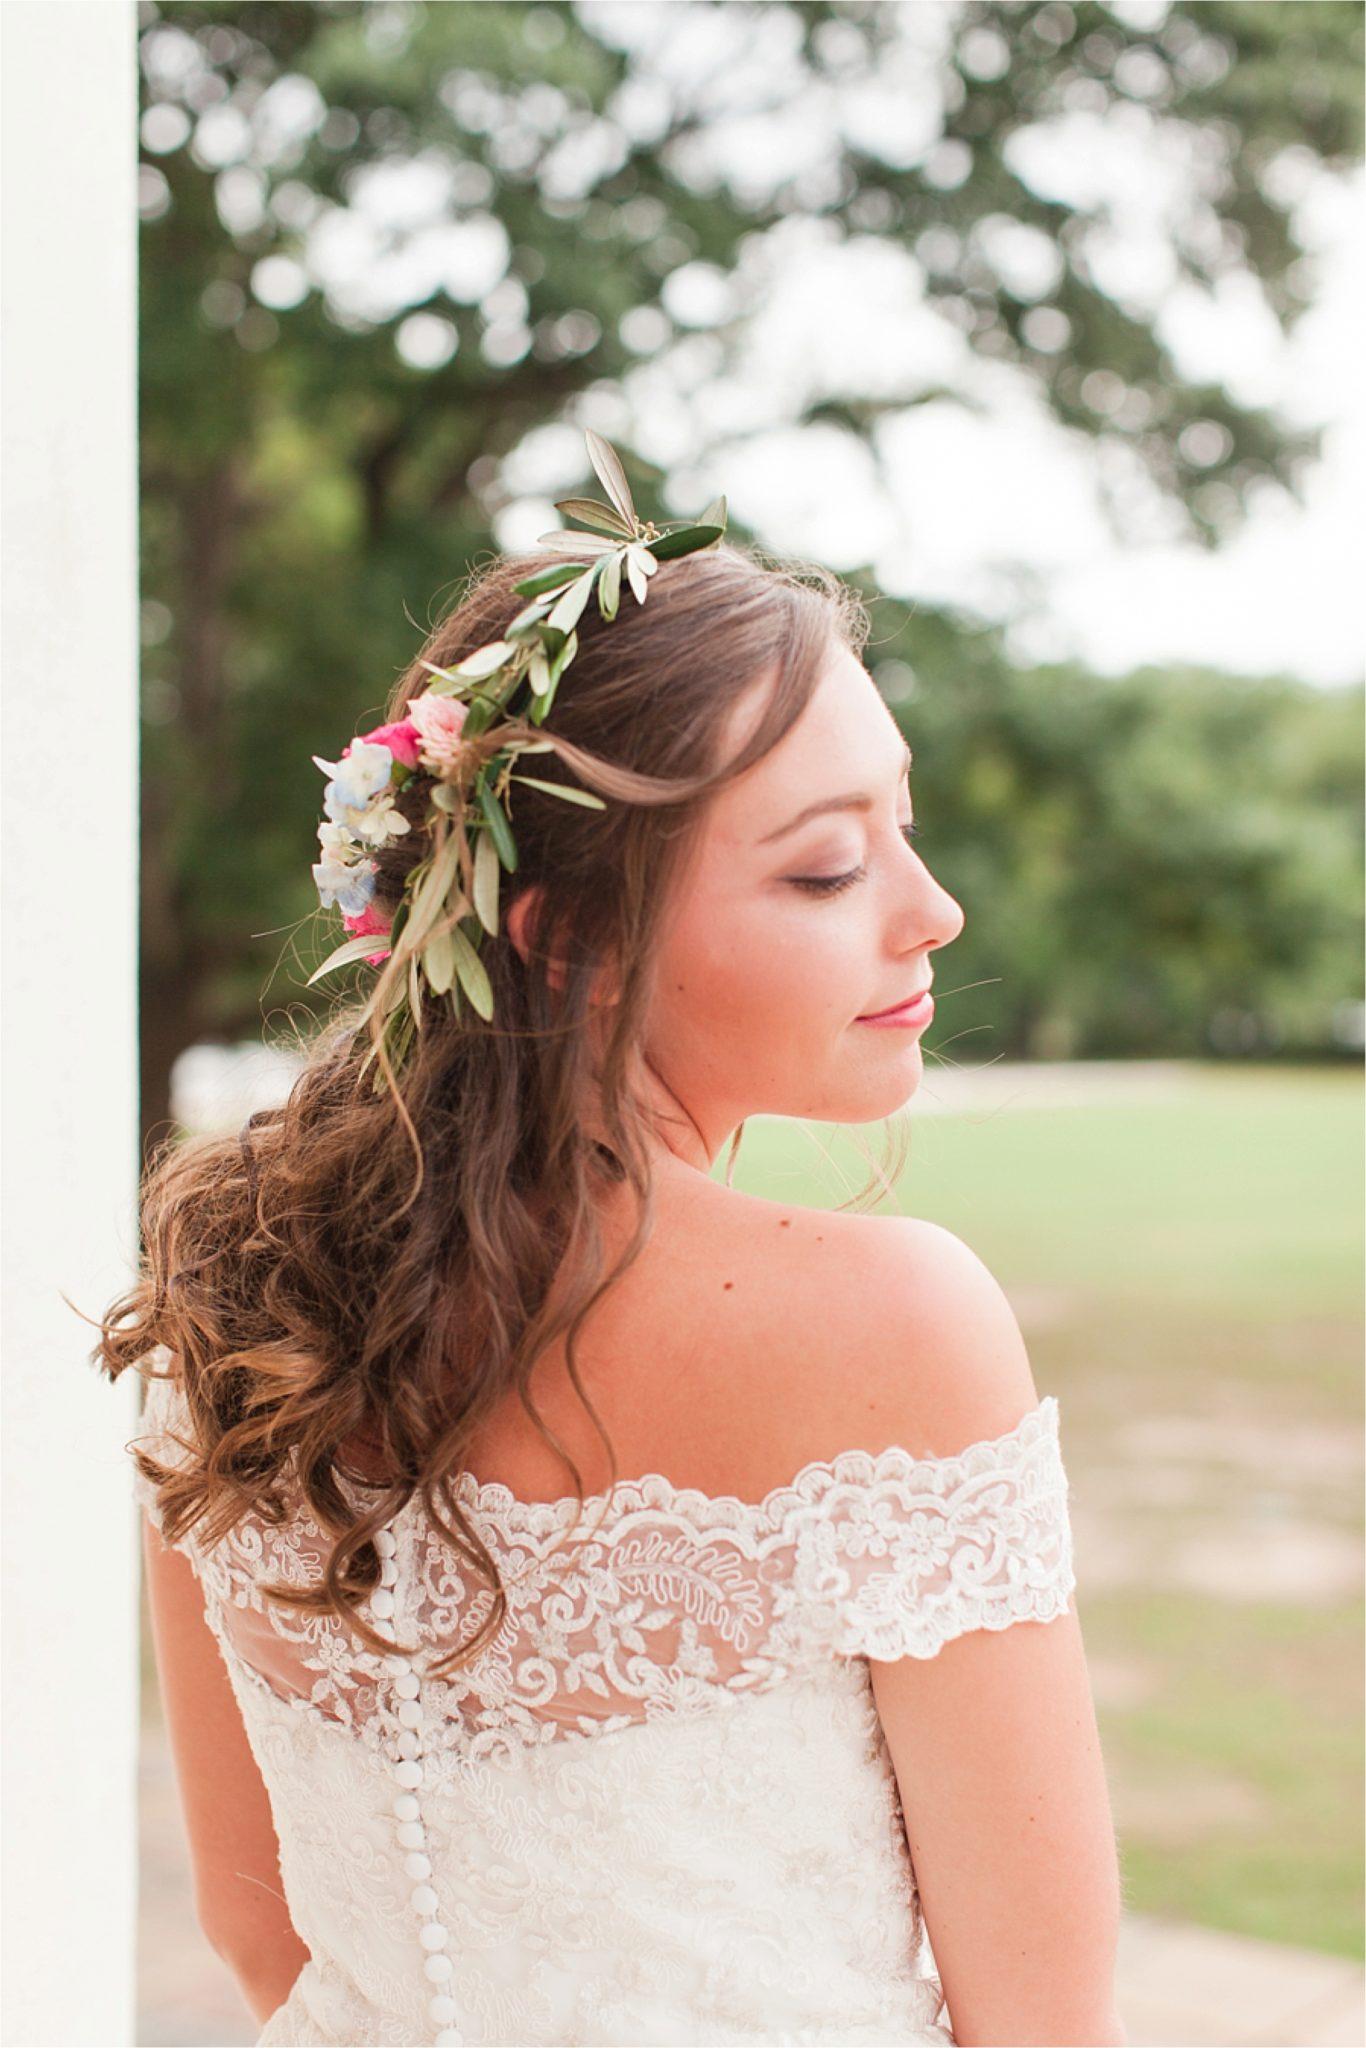 Bridal Portrait Session at Spring Hill College-Byrne Hall-Ginny-Alabama photographer-Wedding bouquet-Bride-Wedding dress-Bridal shoot inspiration-Wedding hair